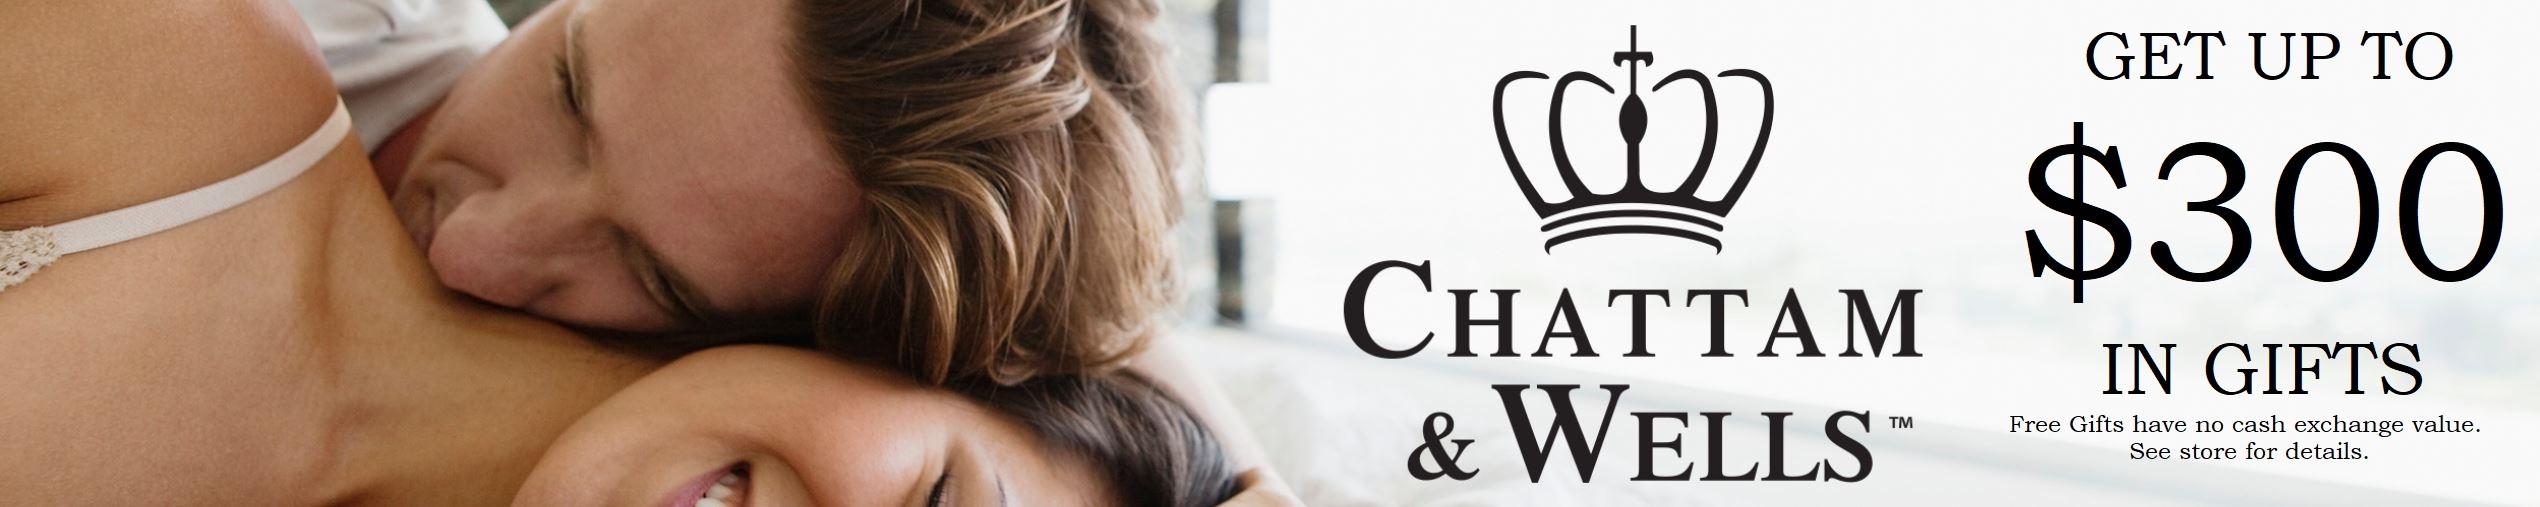 Chattam & Wells Mattress Free Gifts banner